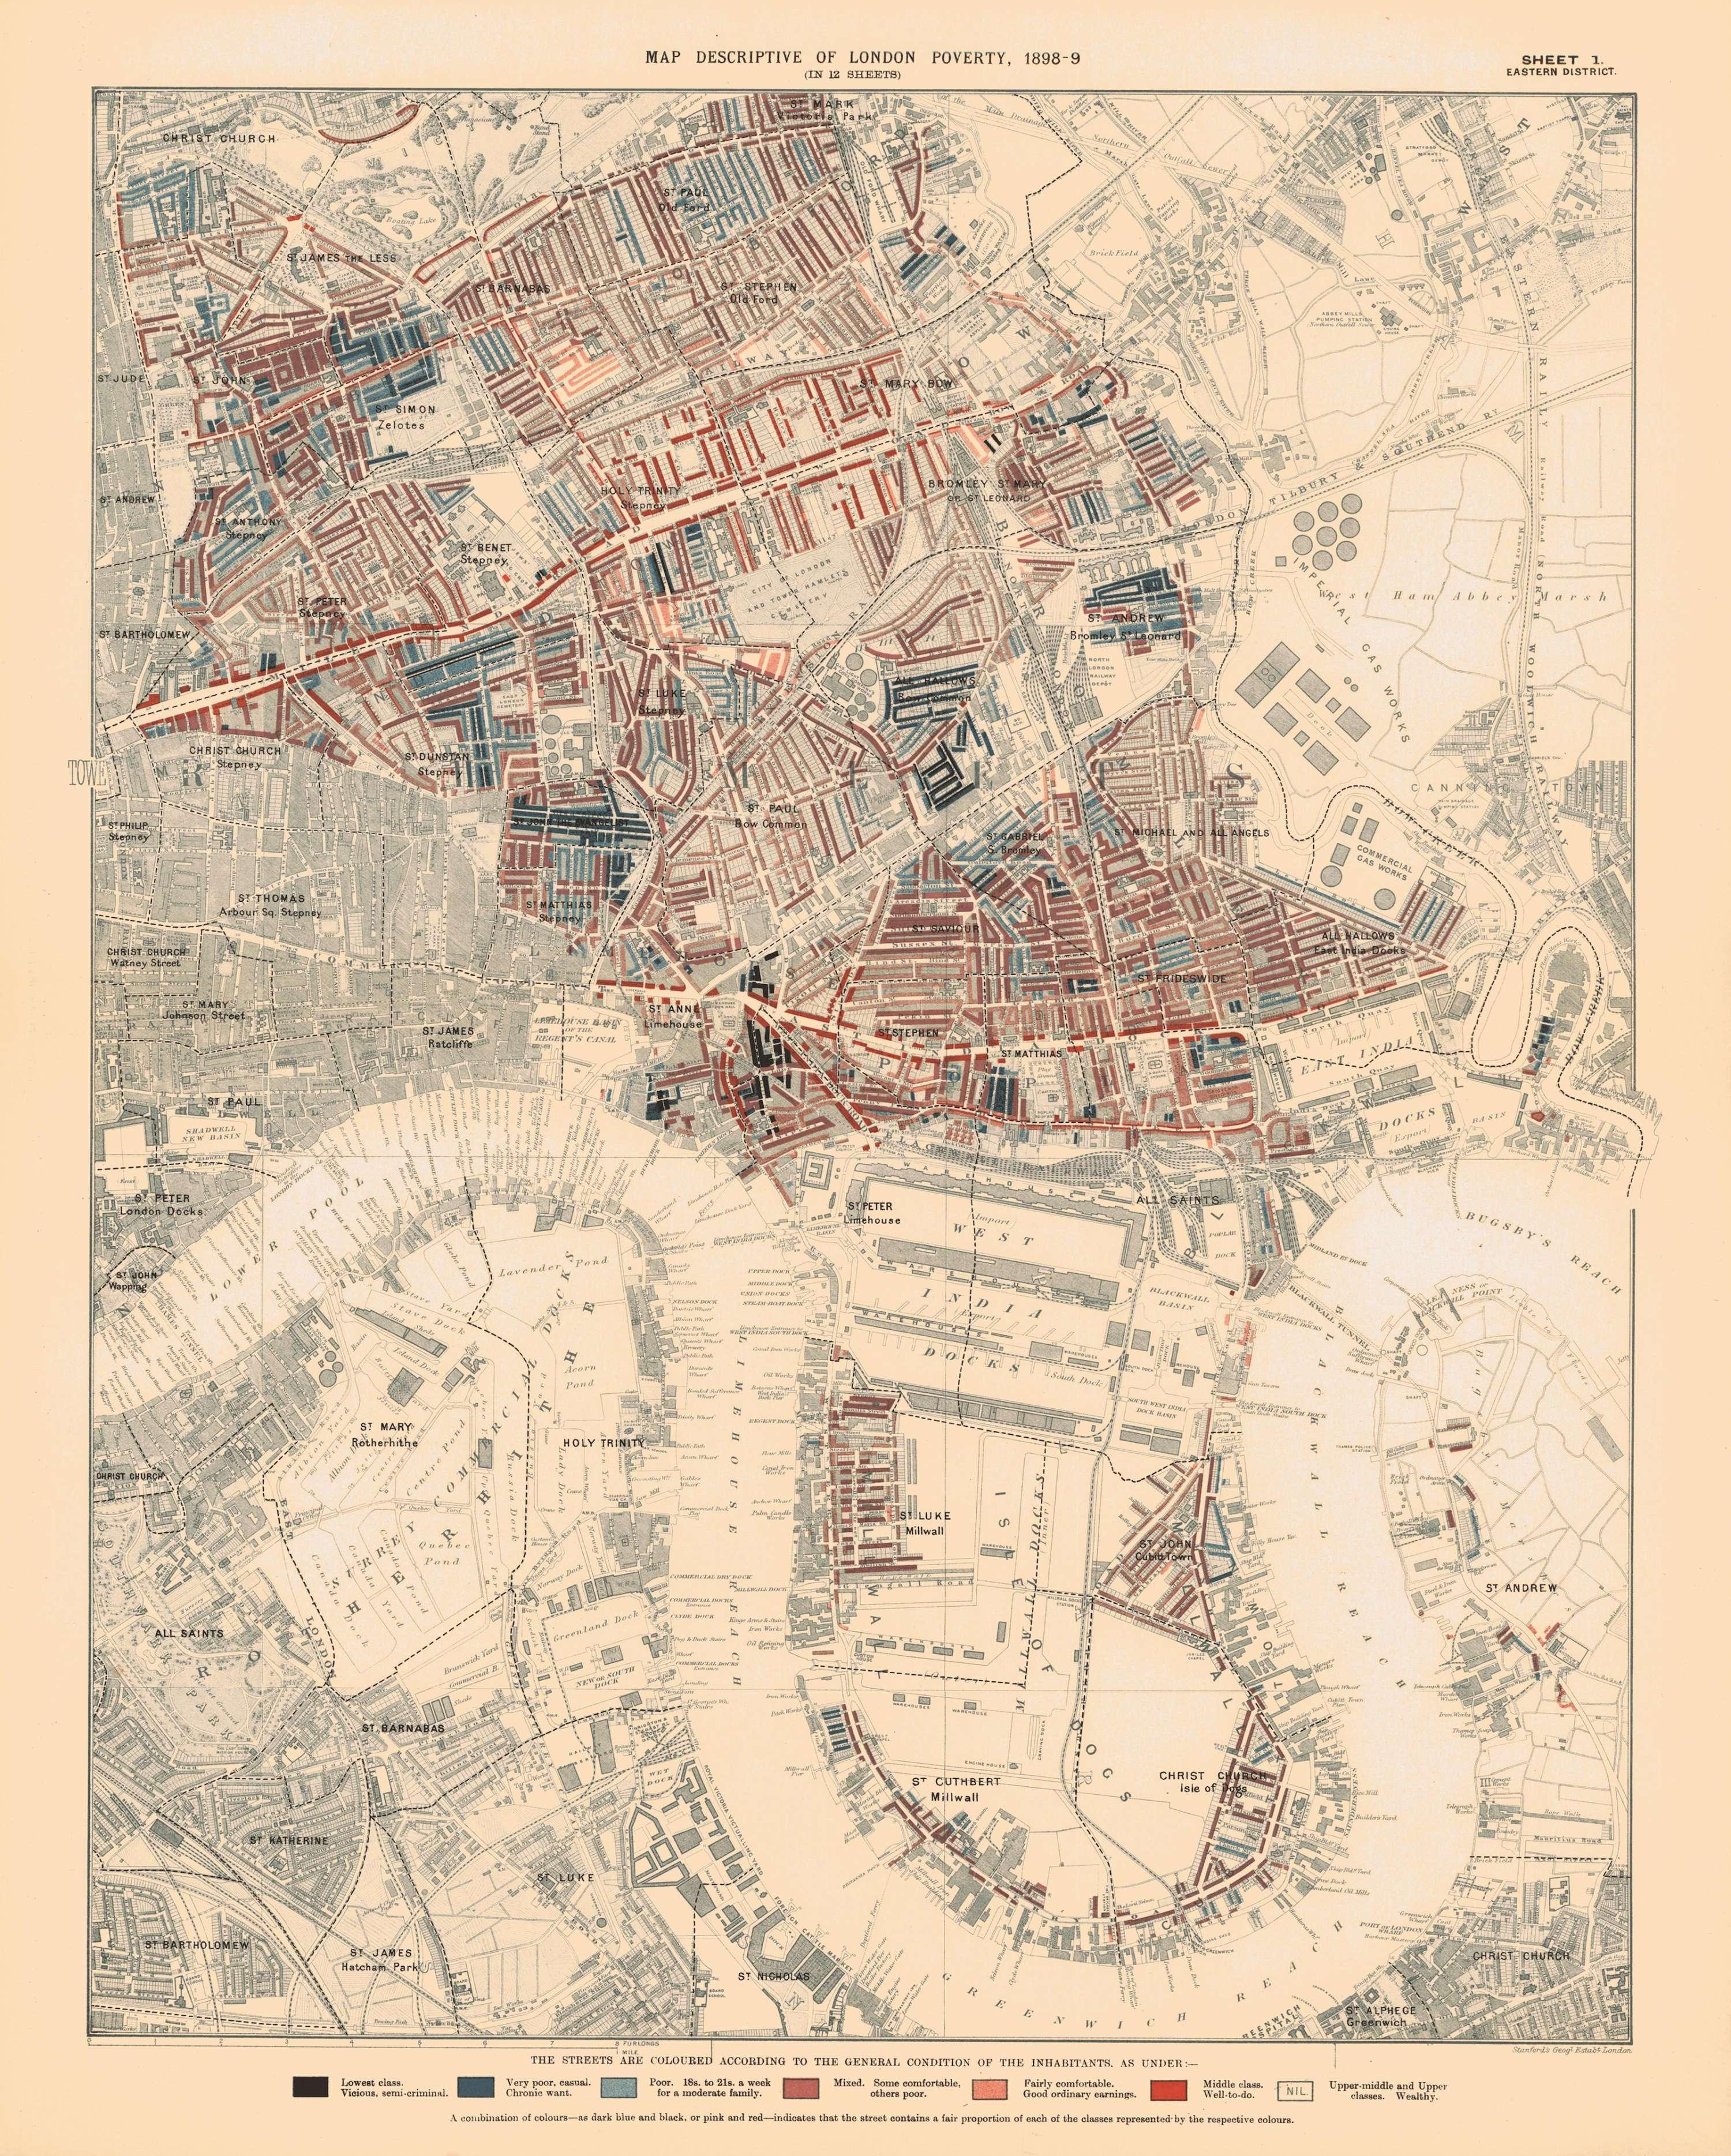 Descriptive map of London poverty